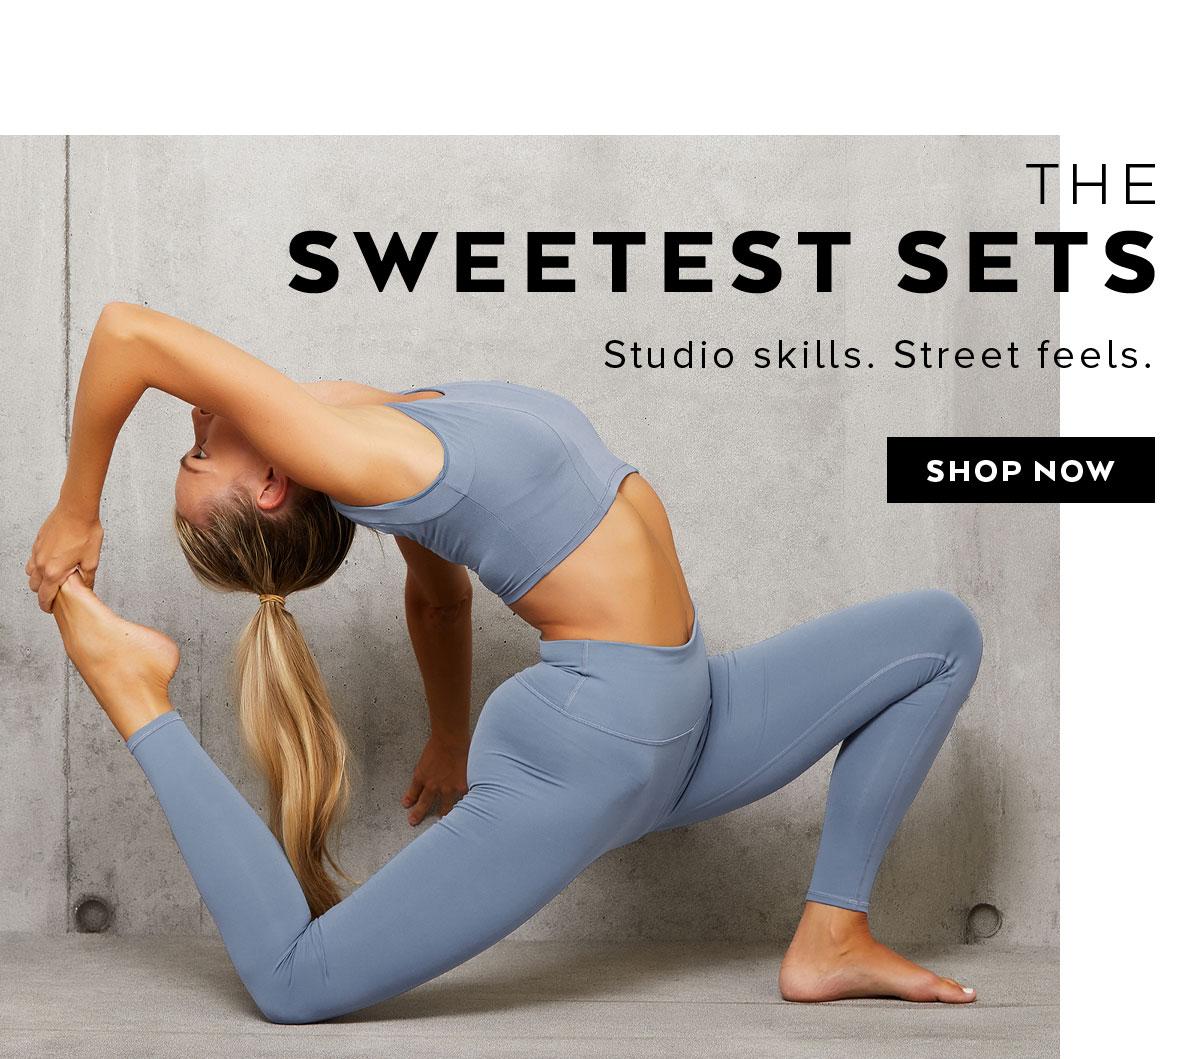 THE SWEETEST SETS. Studio skills. Street feels. SHOP NOW